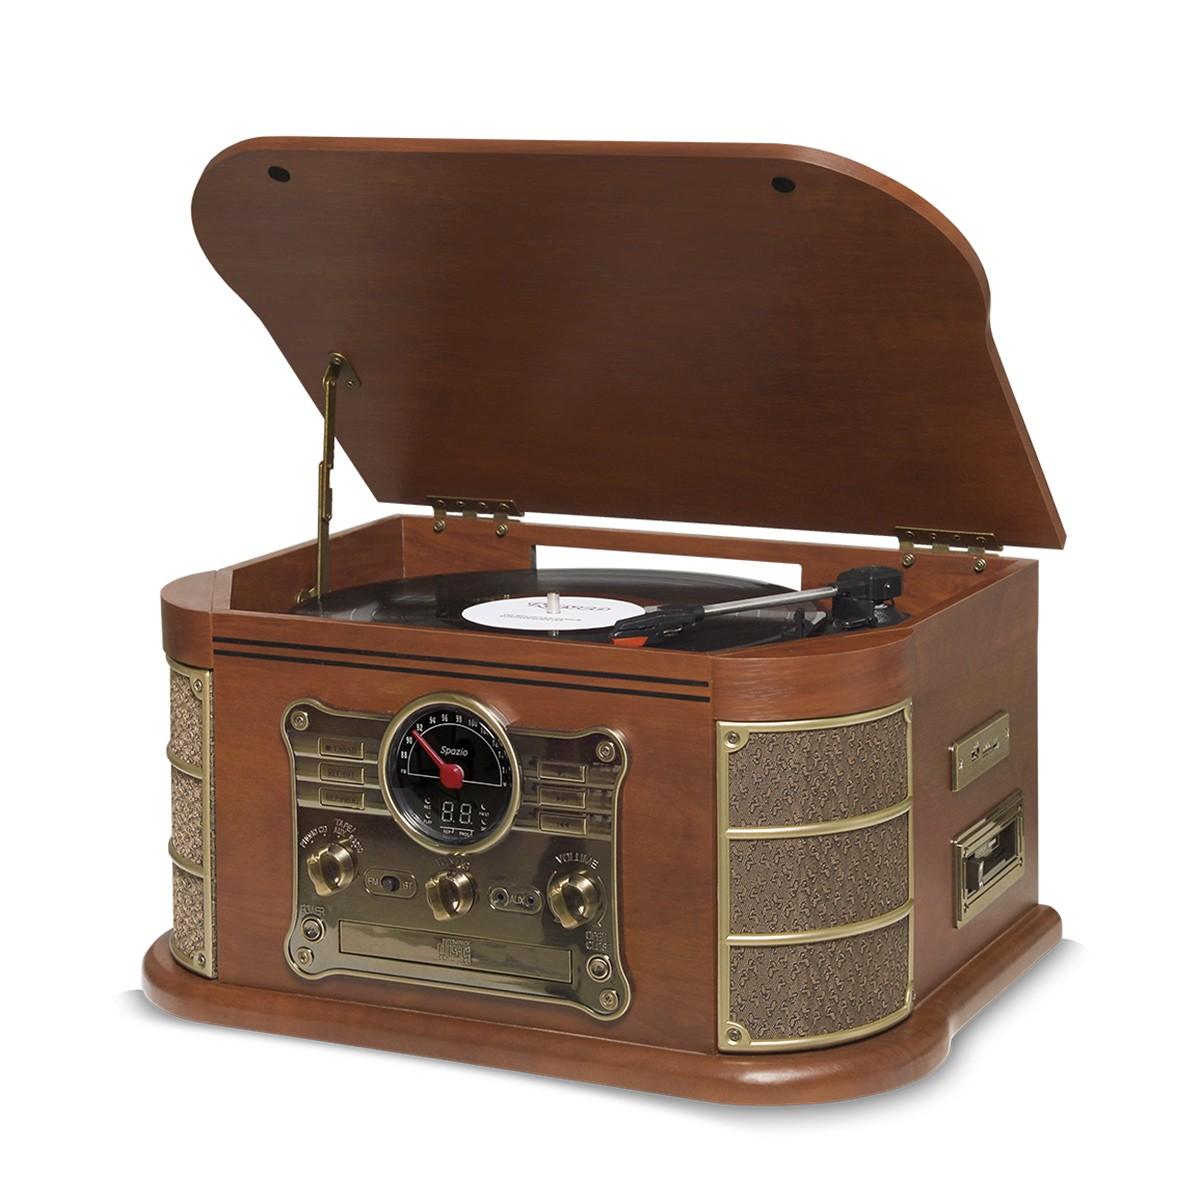 Vitrola Raveo Spazio c/ Toca-Discos, Fita Cassete, BT, CD, Rádio , USB/SD (Rec)